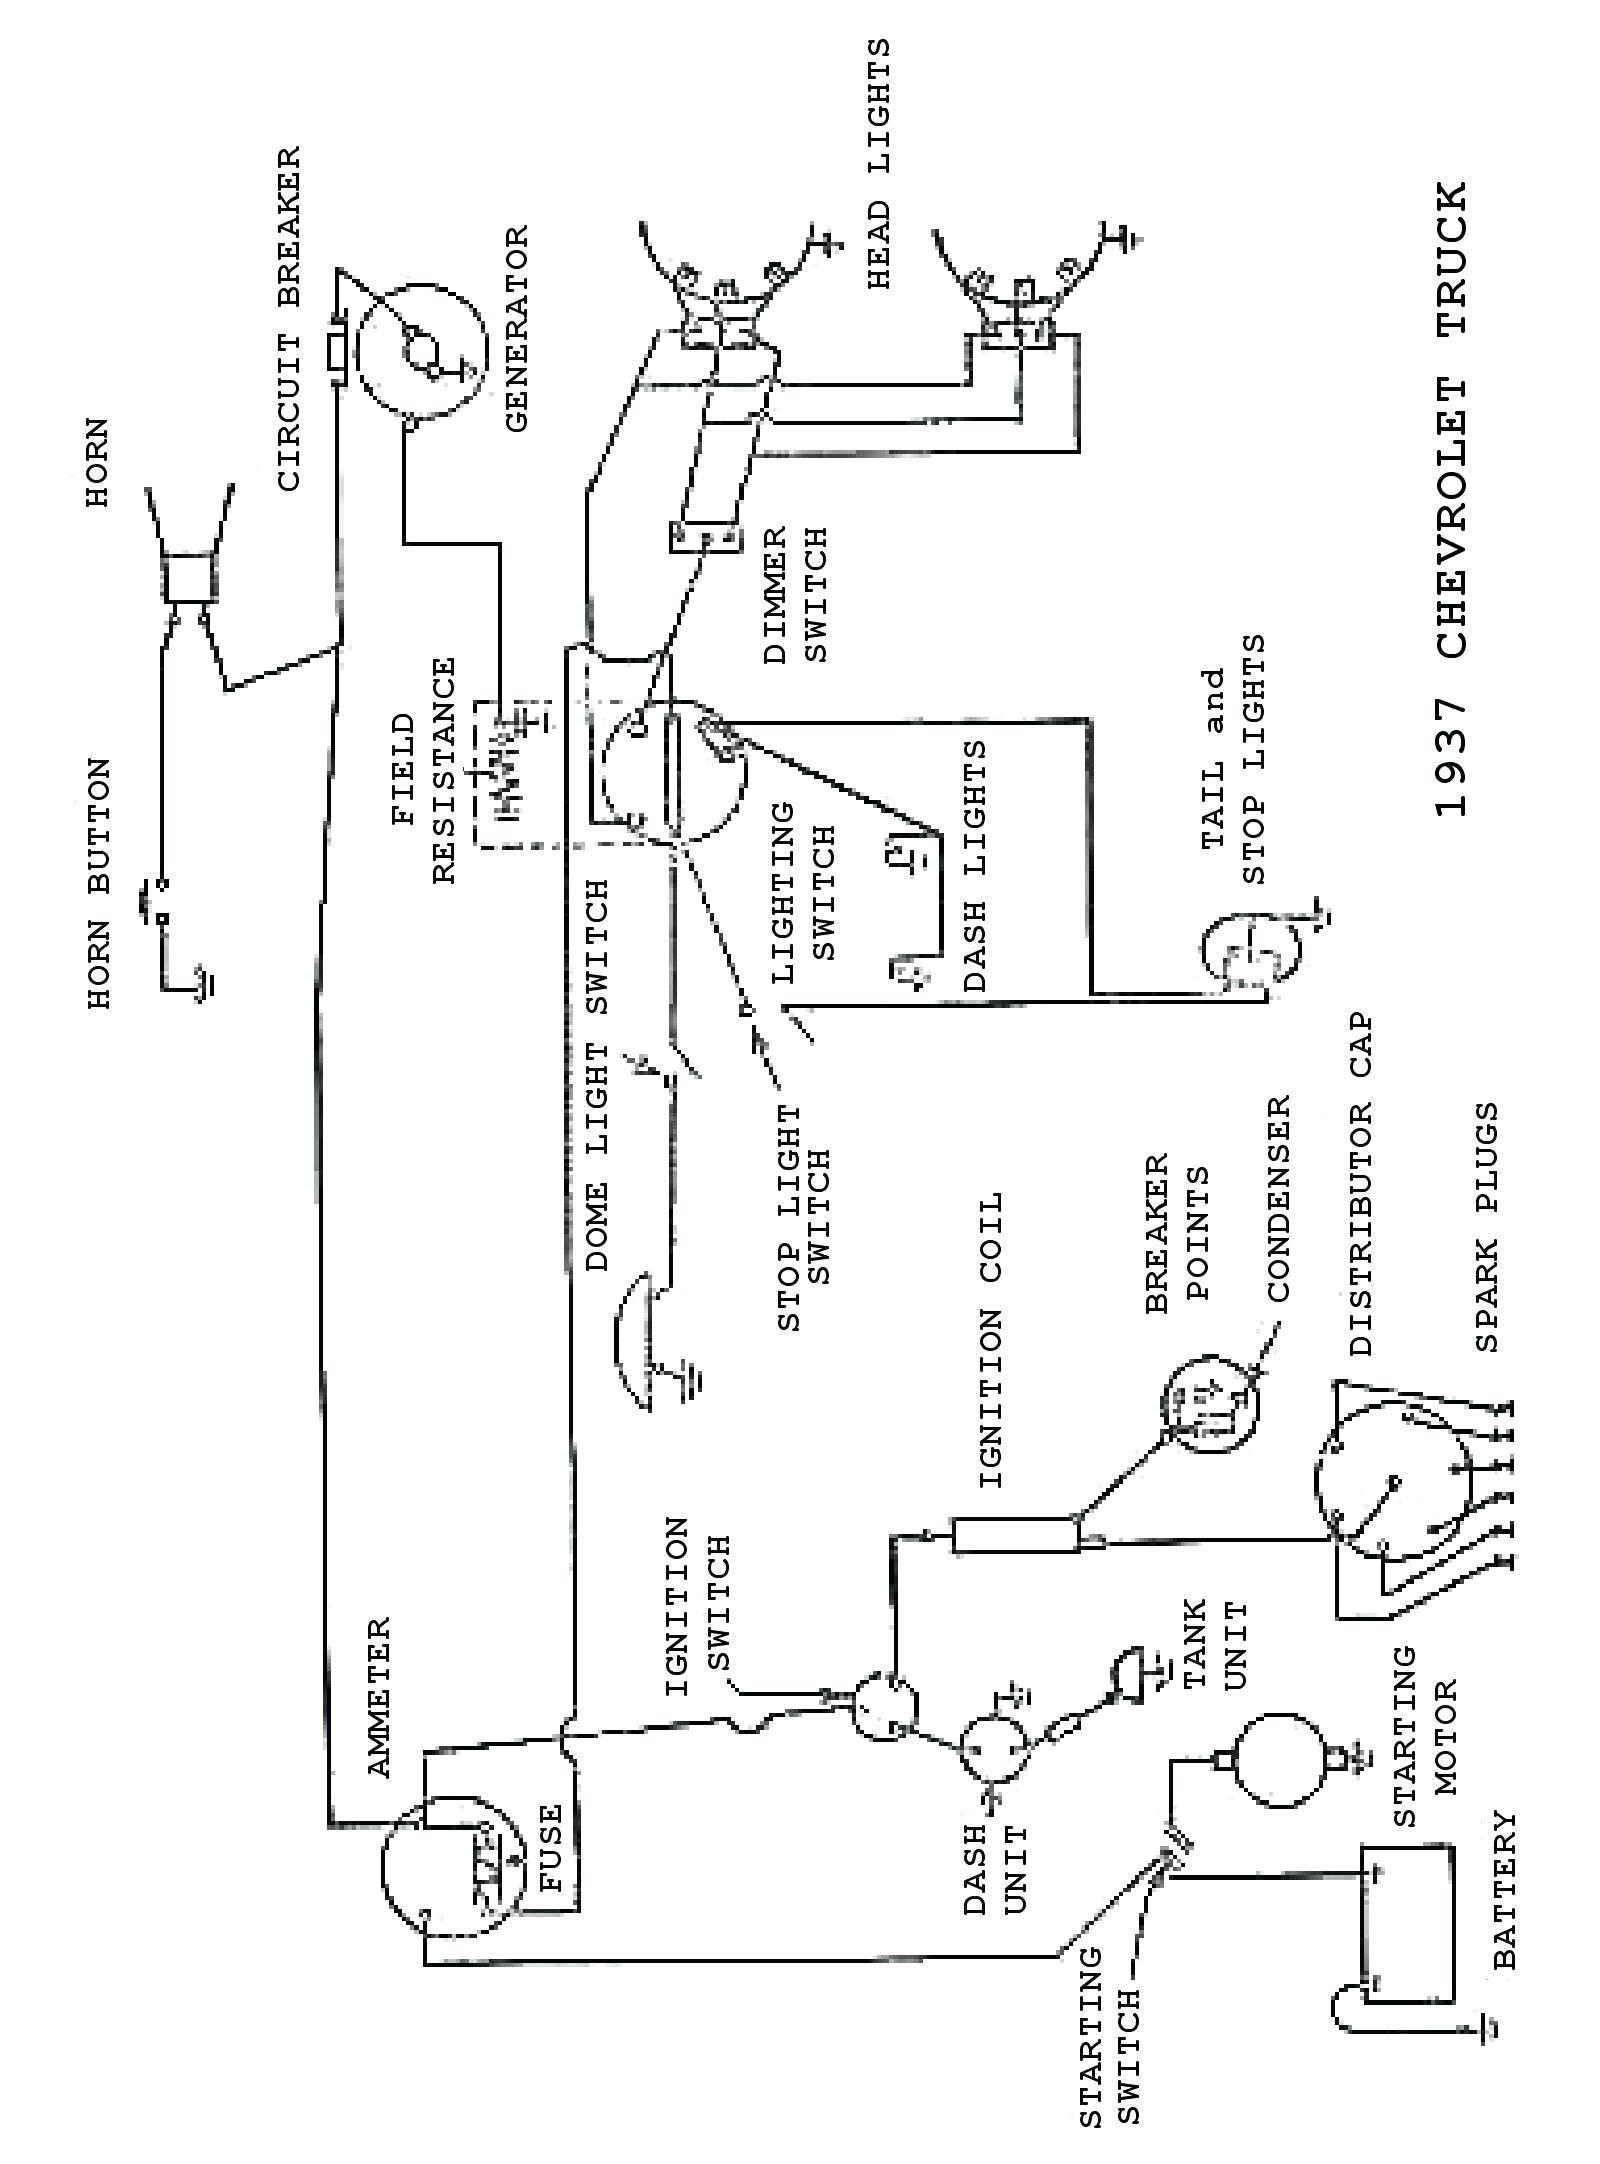 jd 4020 wiring diagram wiring diagram general John Deere 111H Wiring-Diagram